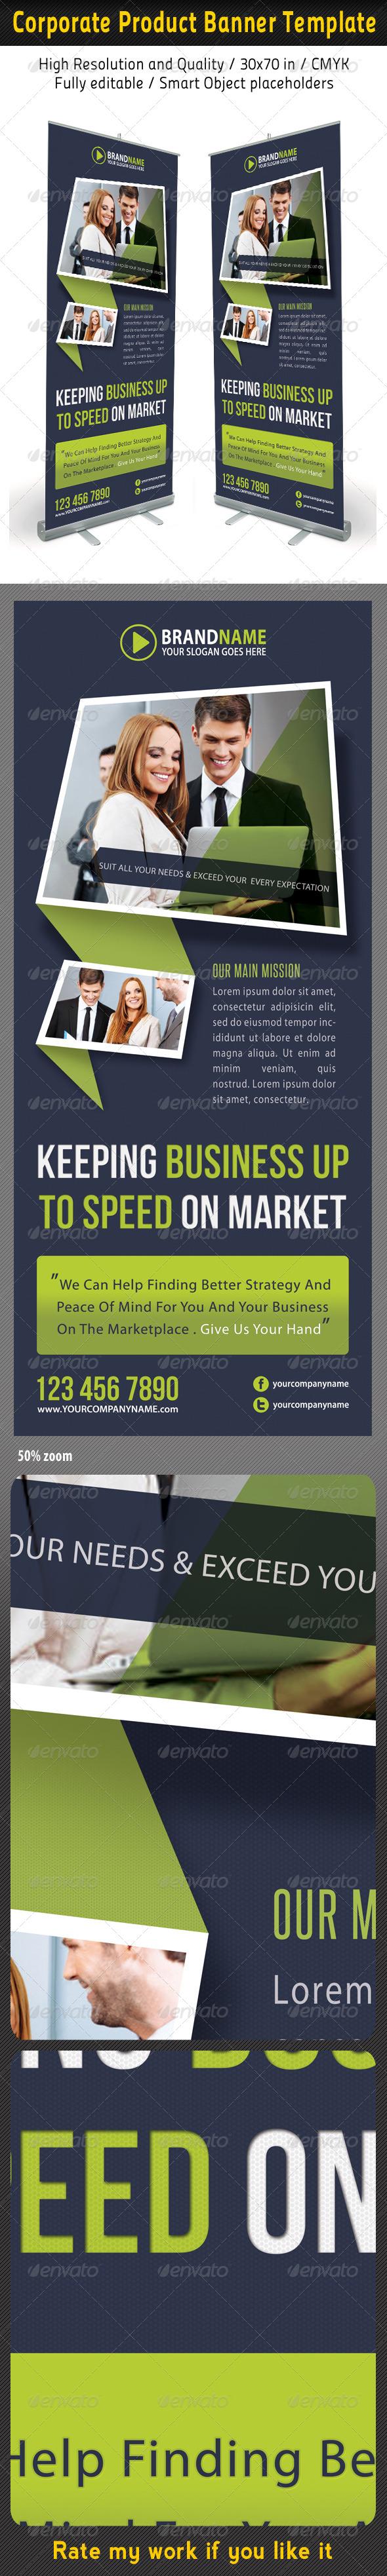 Corporate Multipurpose Banner Template 32 - Signage Print Templates